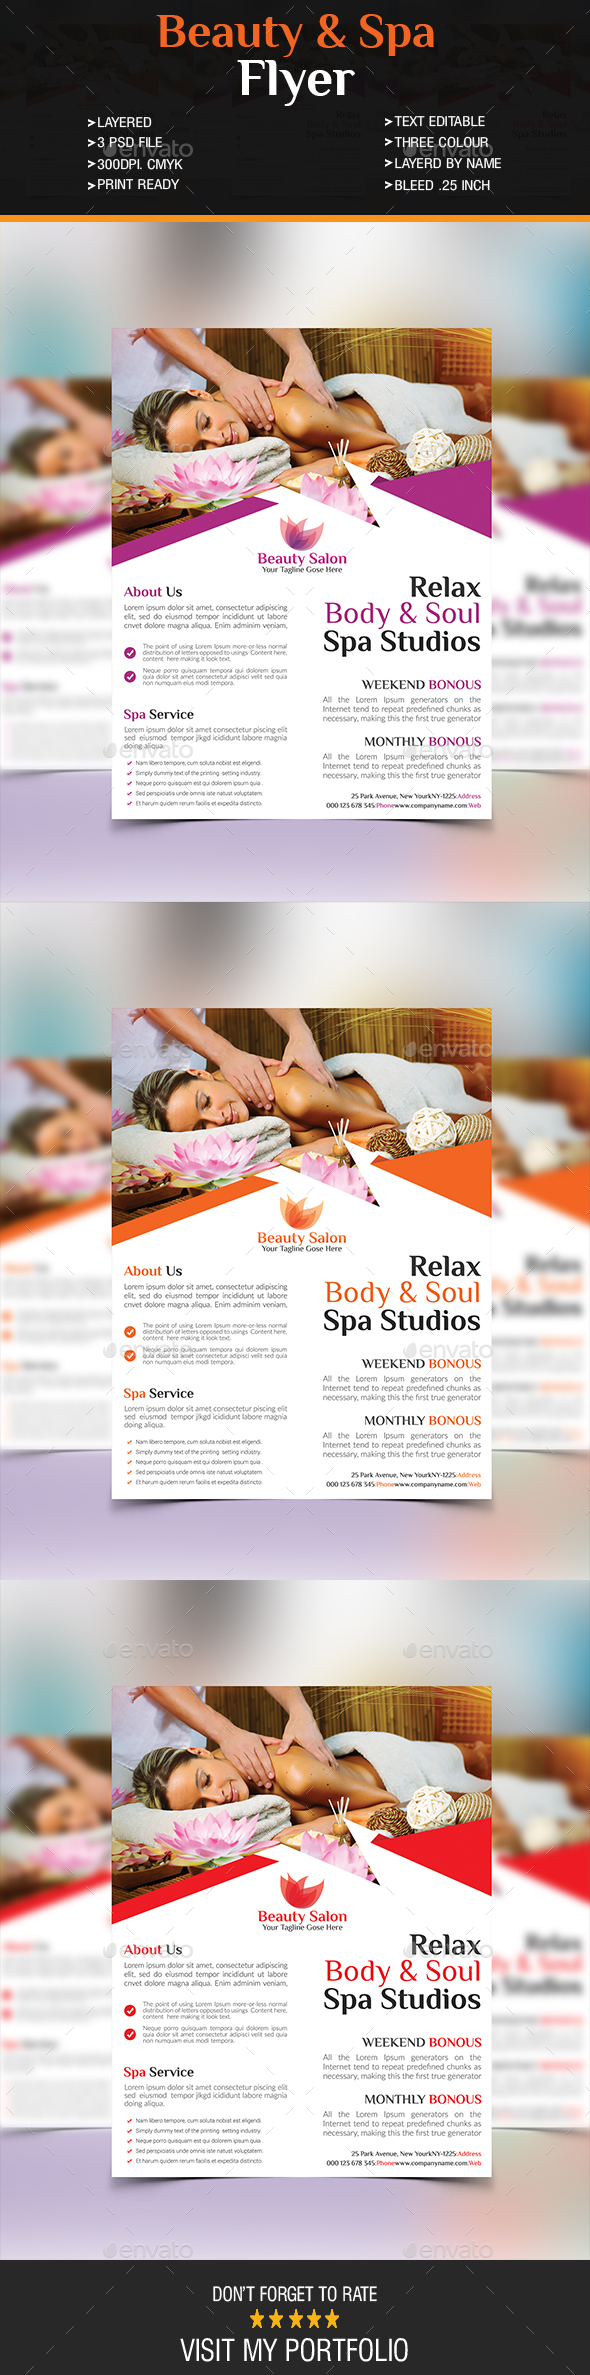 Beauty & Spa Flyer - Stationery Print Templates